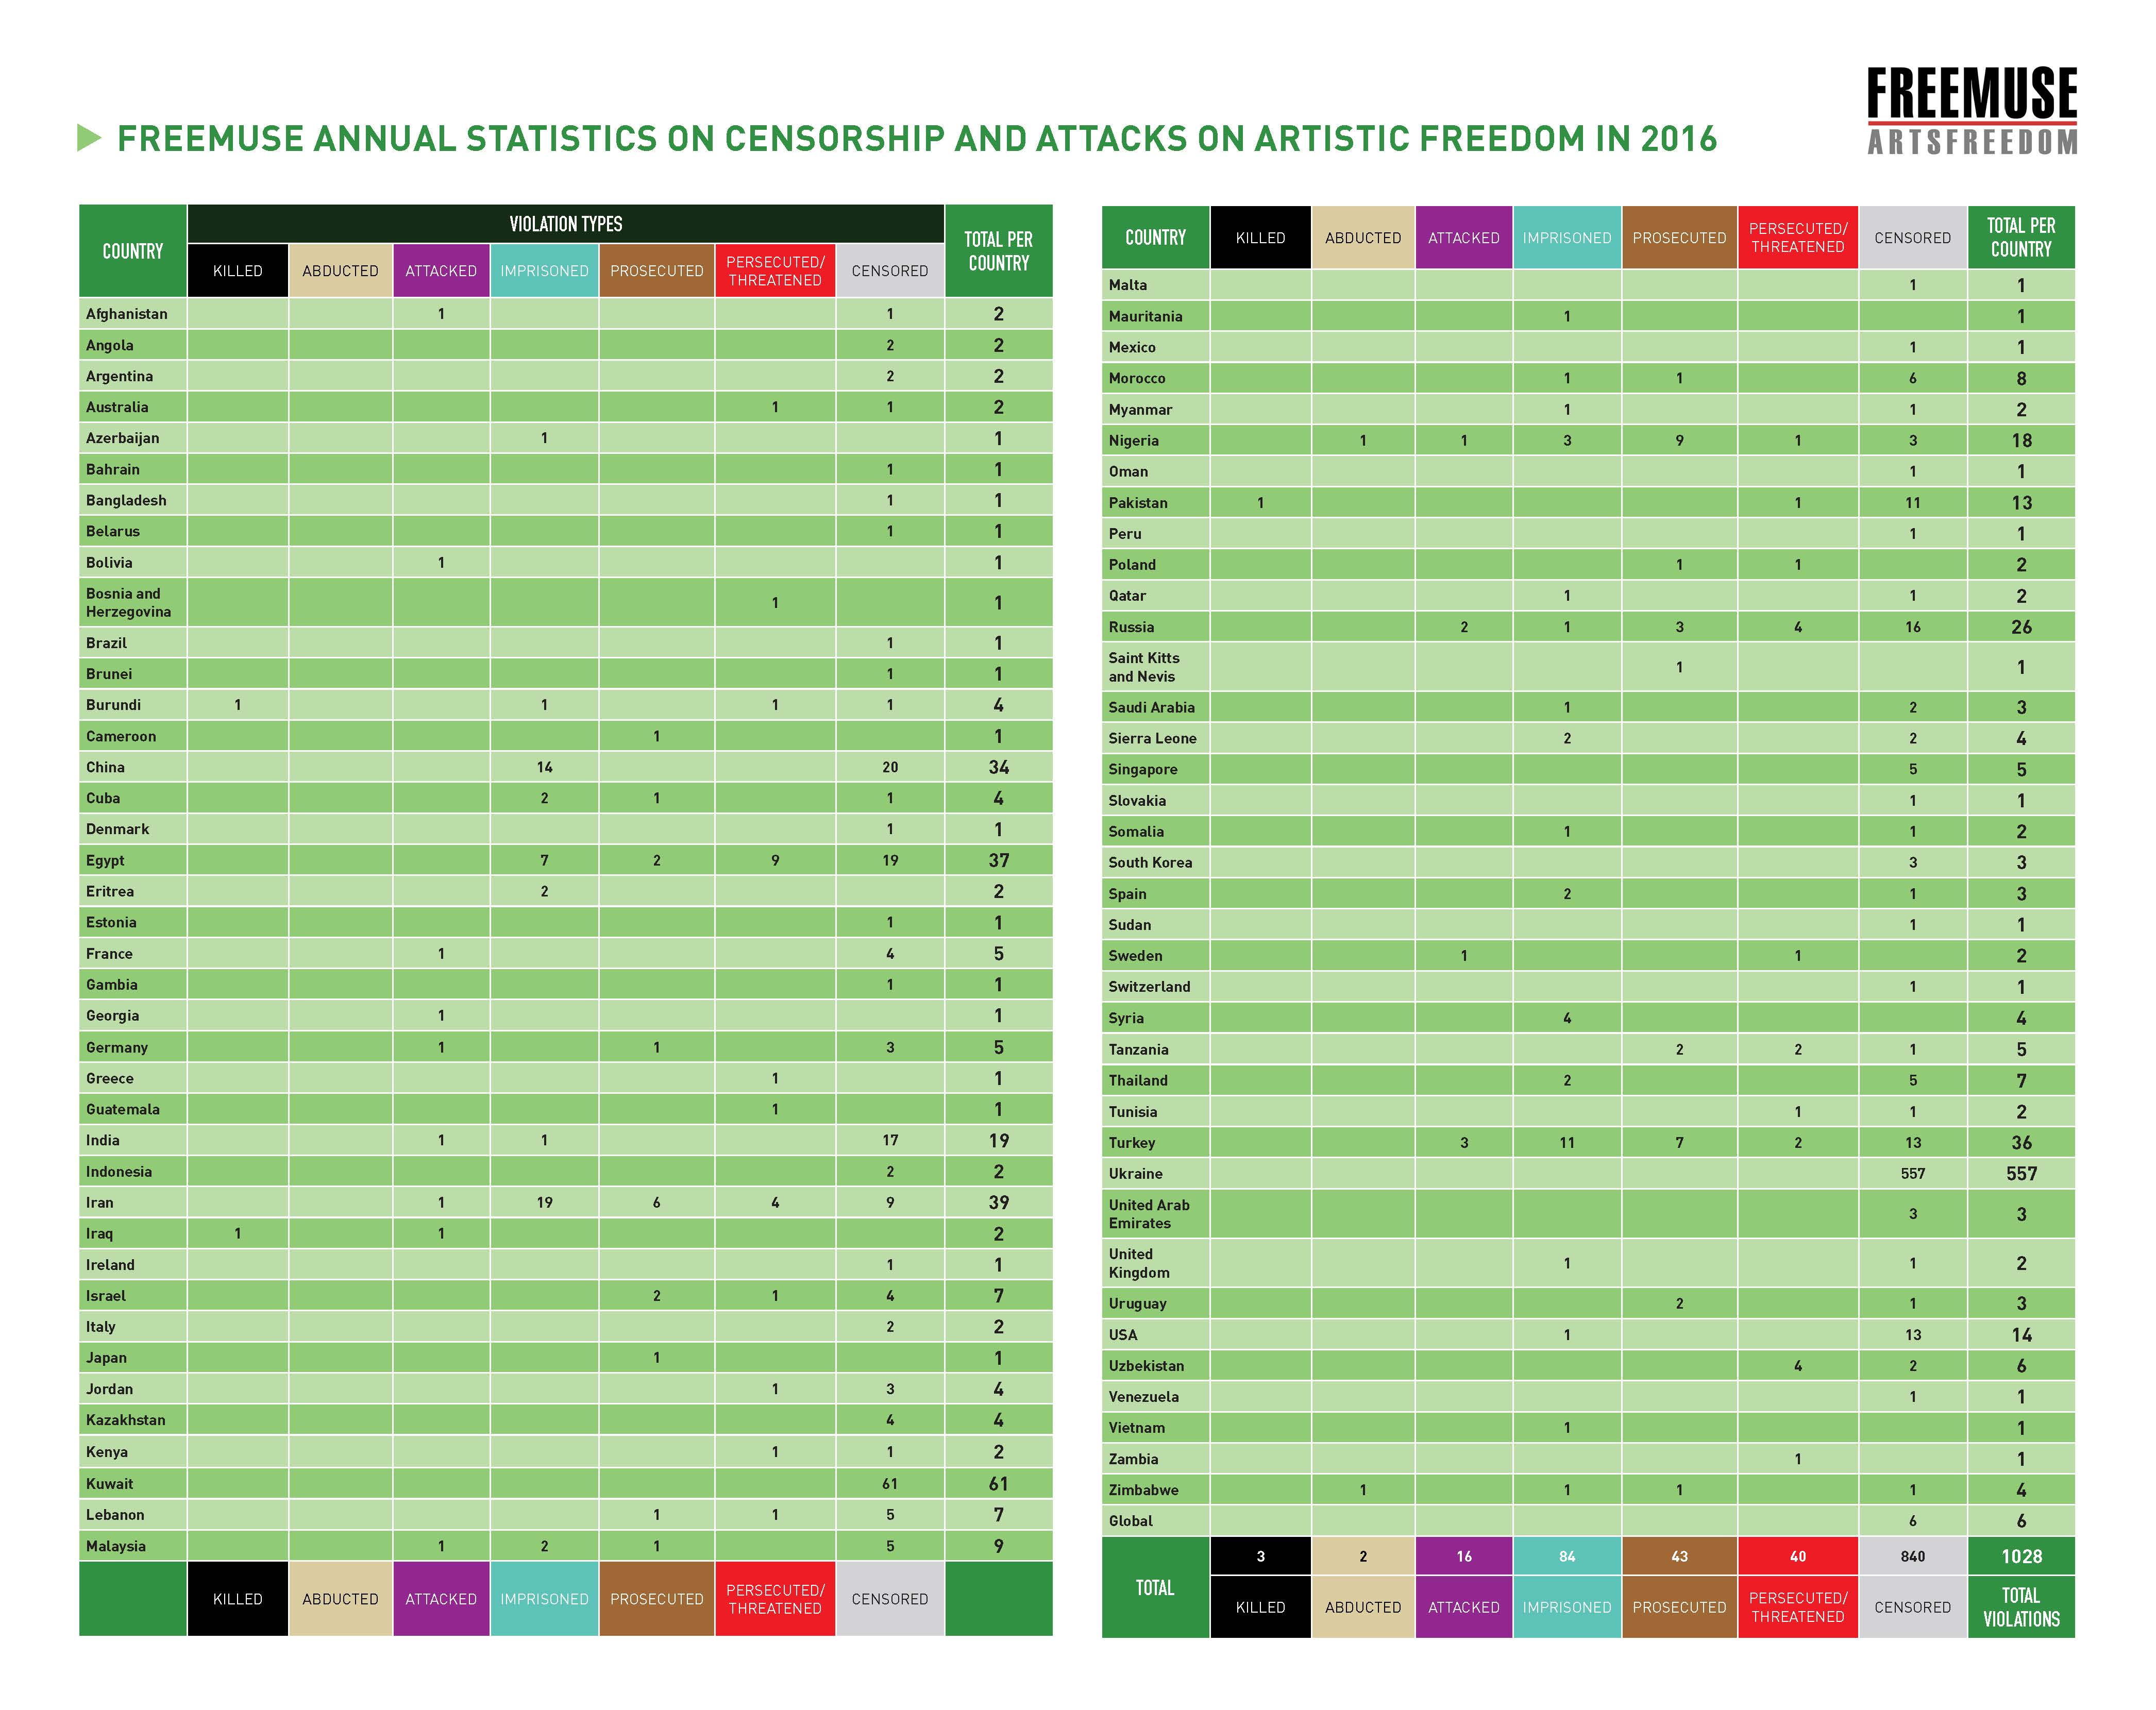 country-chart-art-under-threat-2016-freemuse